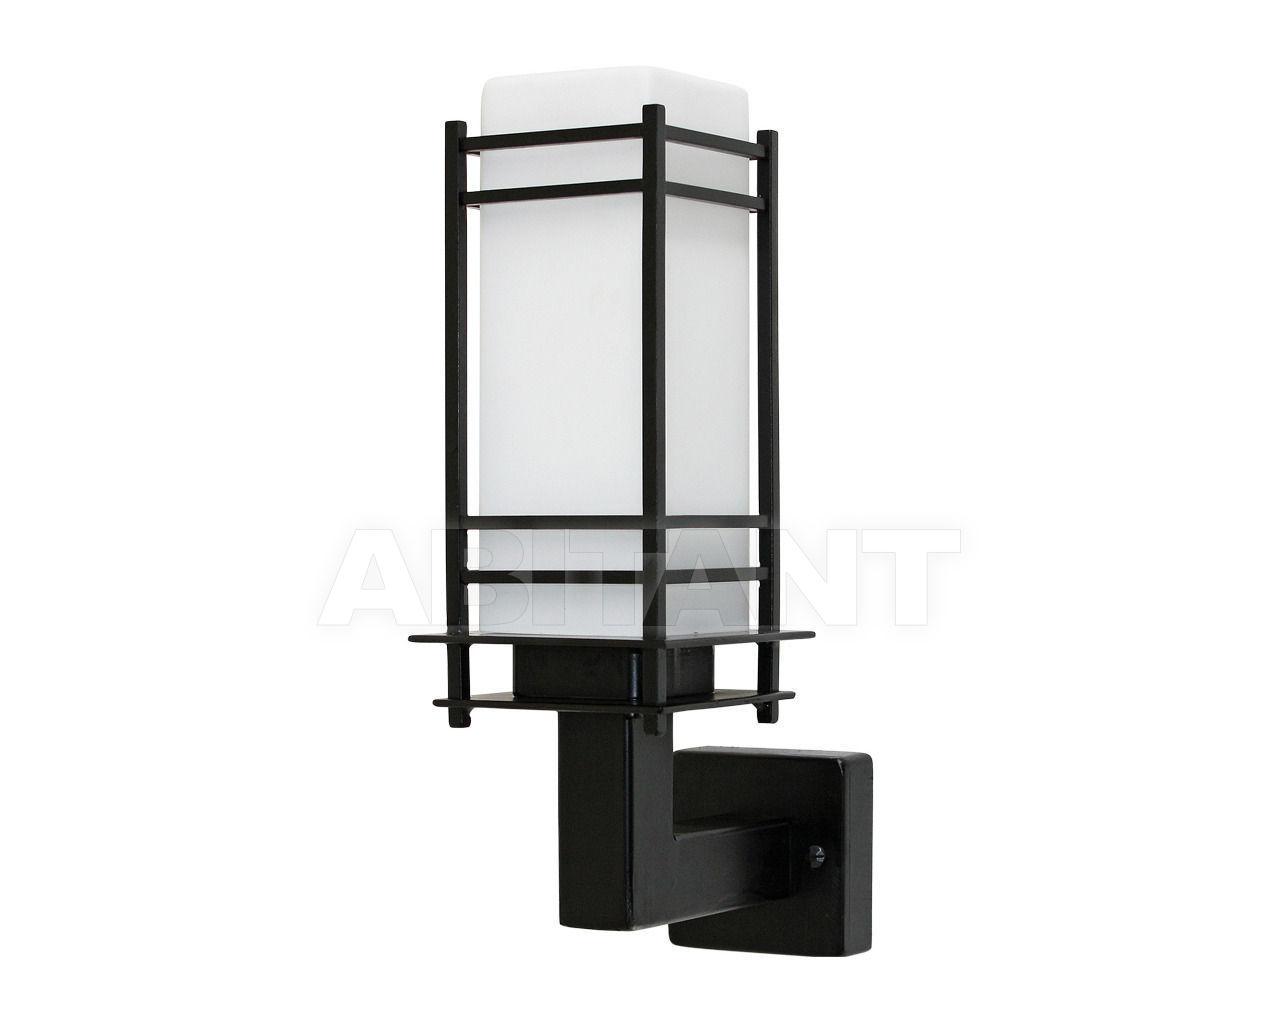 Купить Светильник настенный FMB Leuchten Schmiedeeisen Lampen Und Leuchten 90180